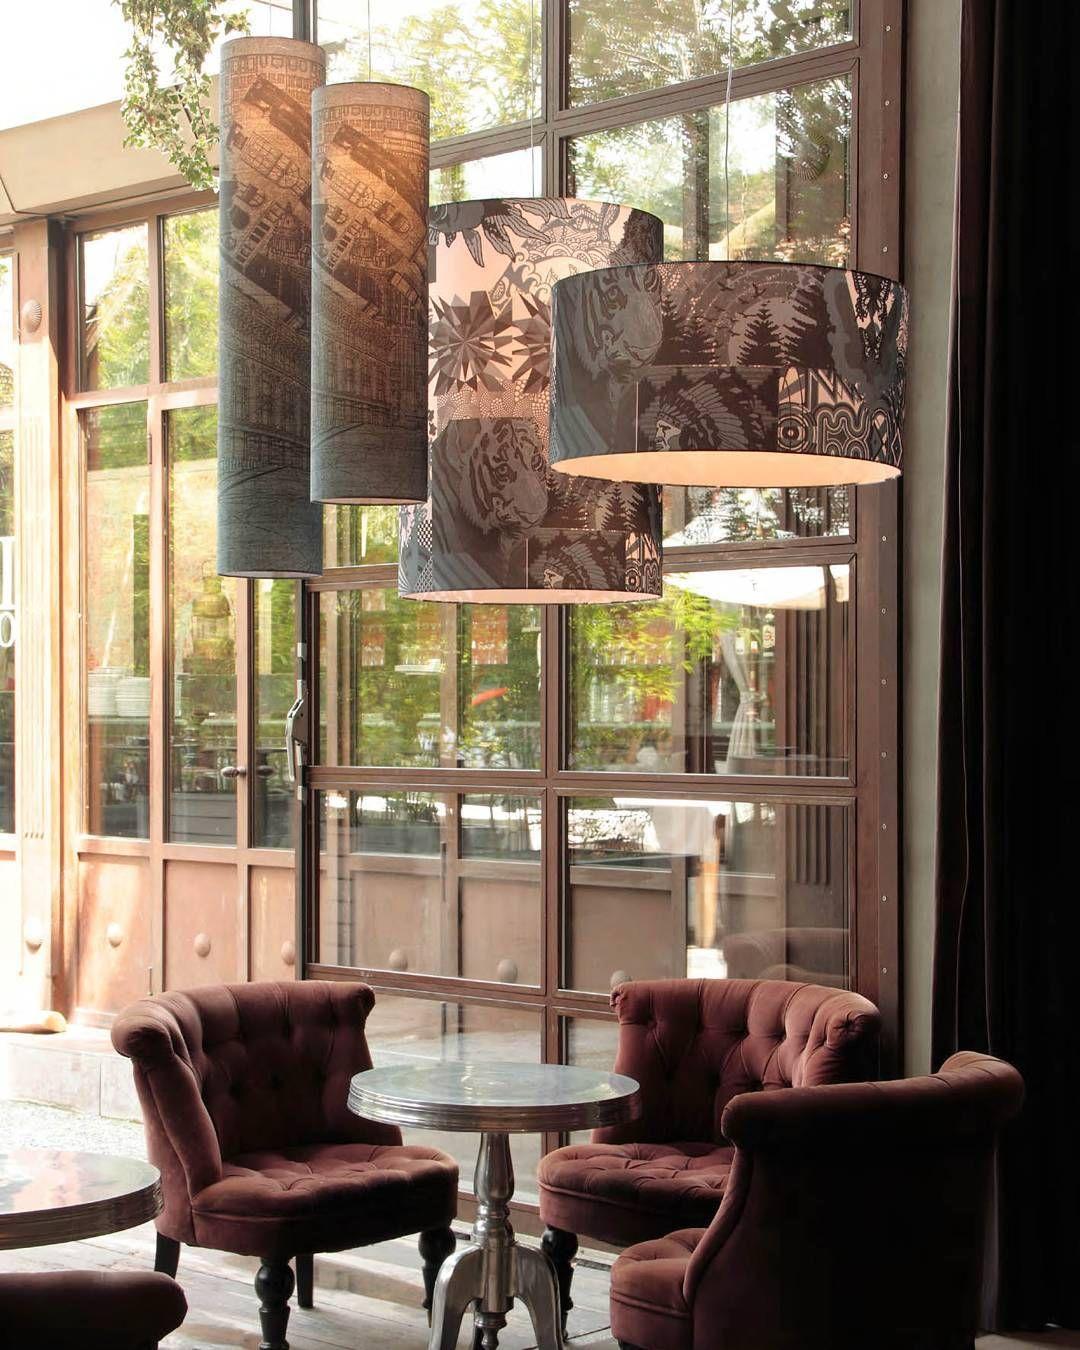 furnituredesign #lighting #table #poltrone #sofa #tavolino ... - Arredamento Casa Home